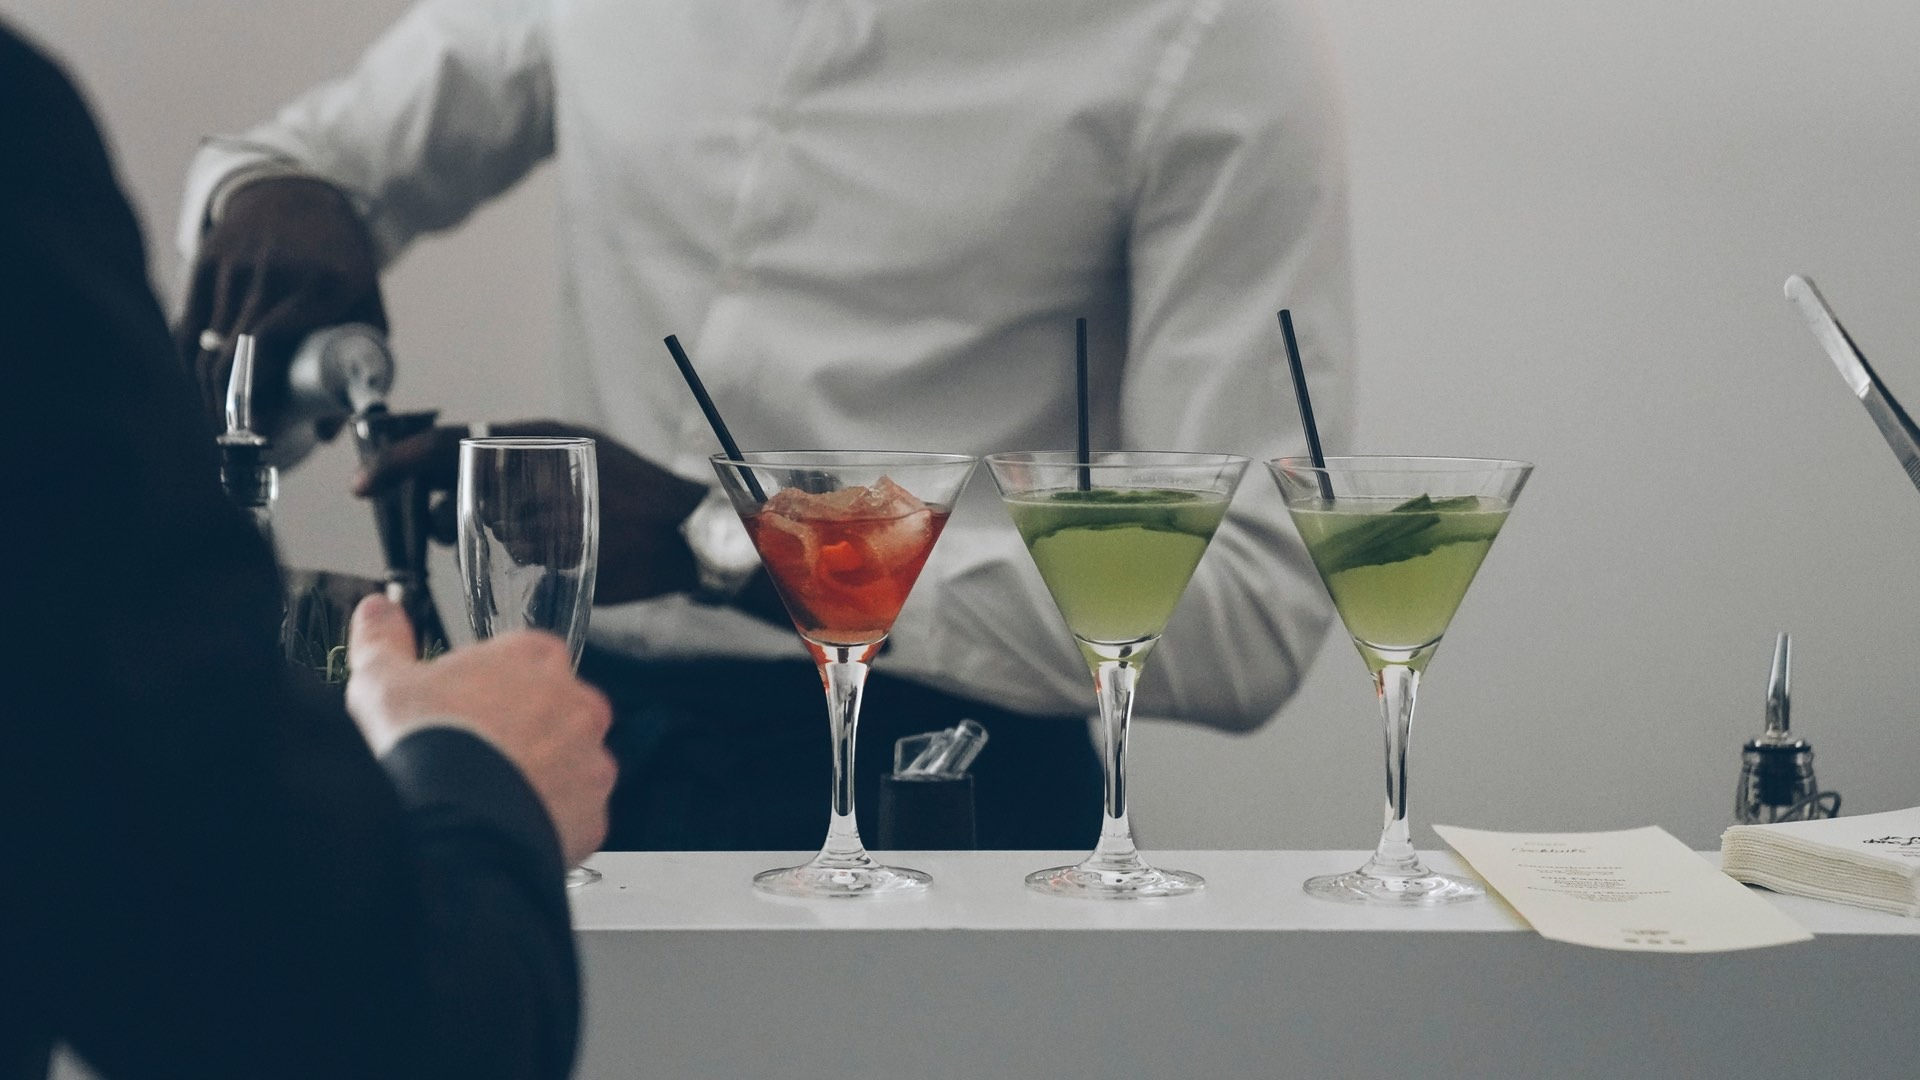 No More Penguins-Cocktails